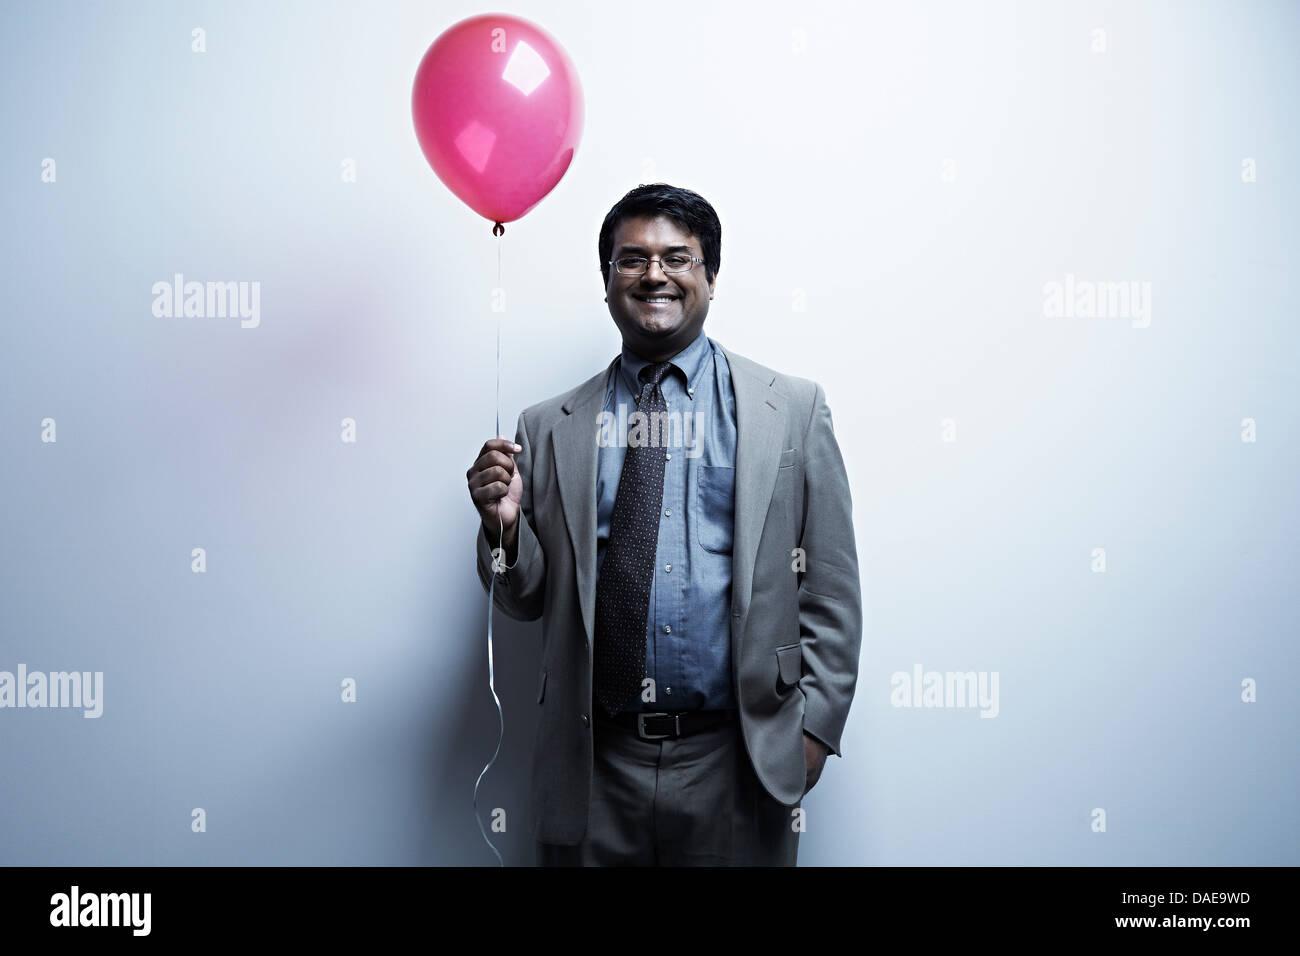 Studio portrait of businessman holding red balloon - Stock Image